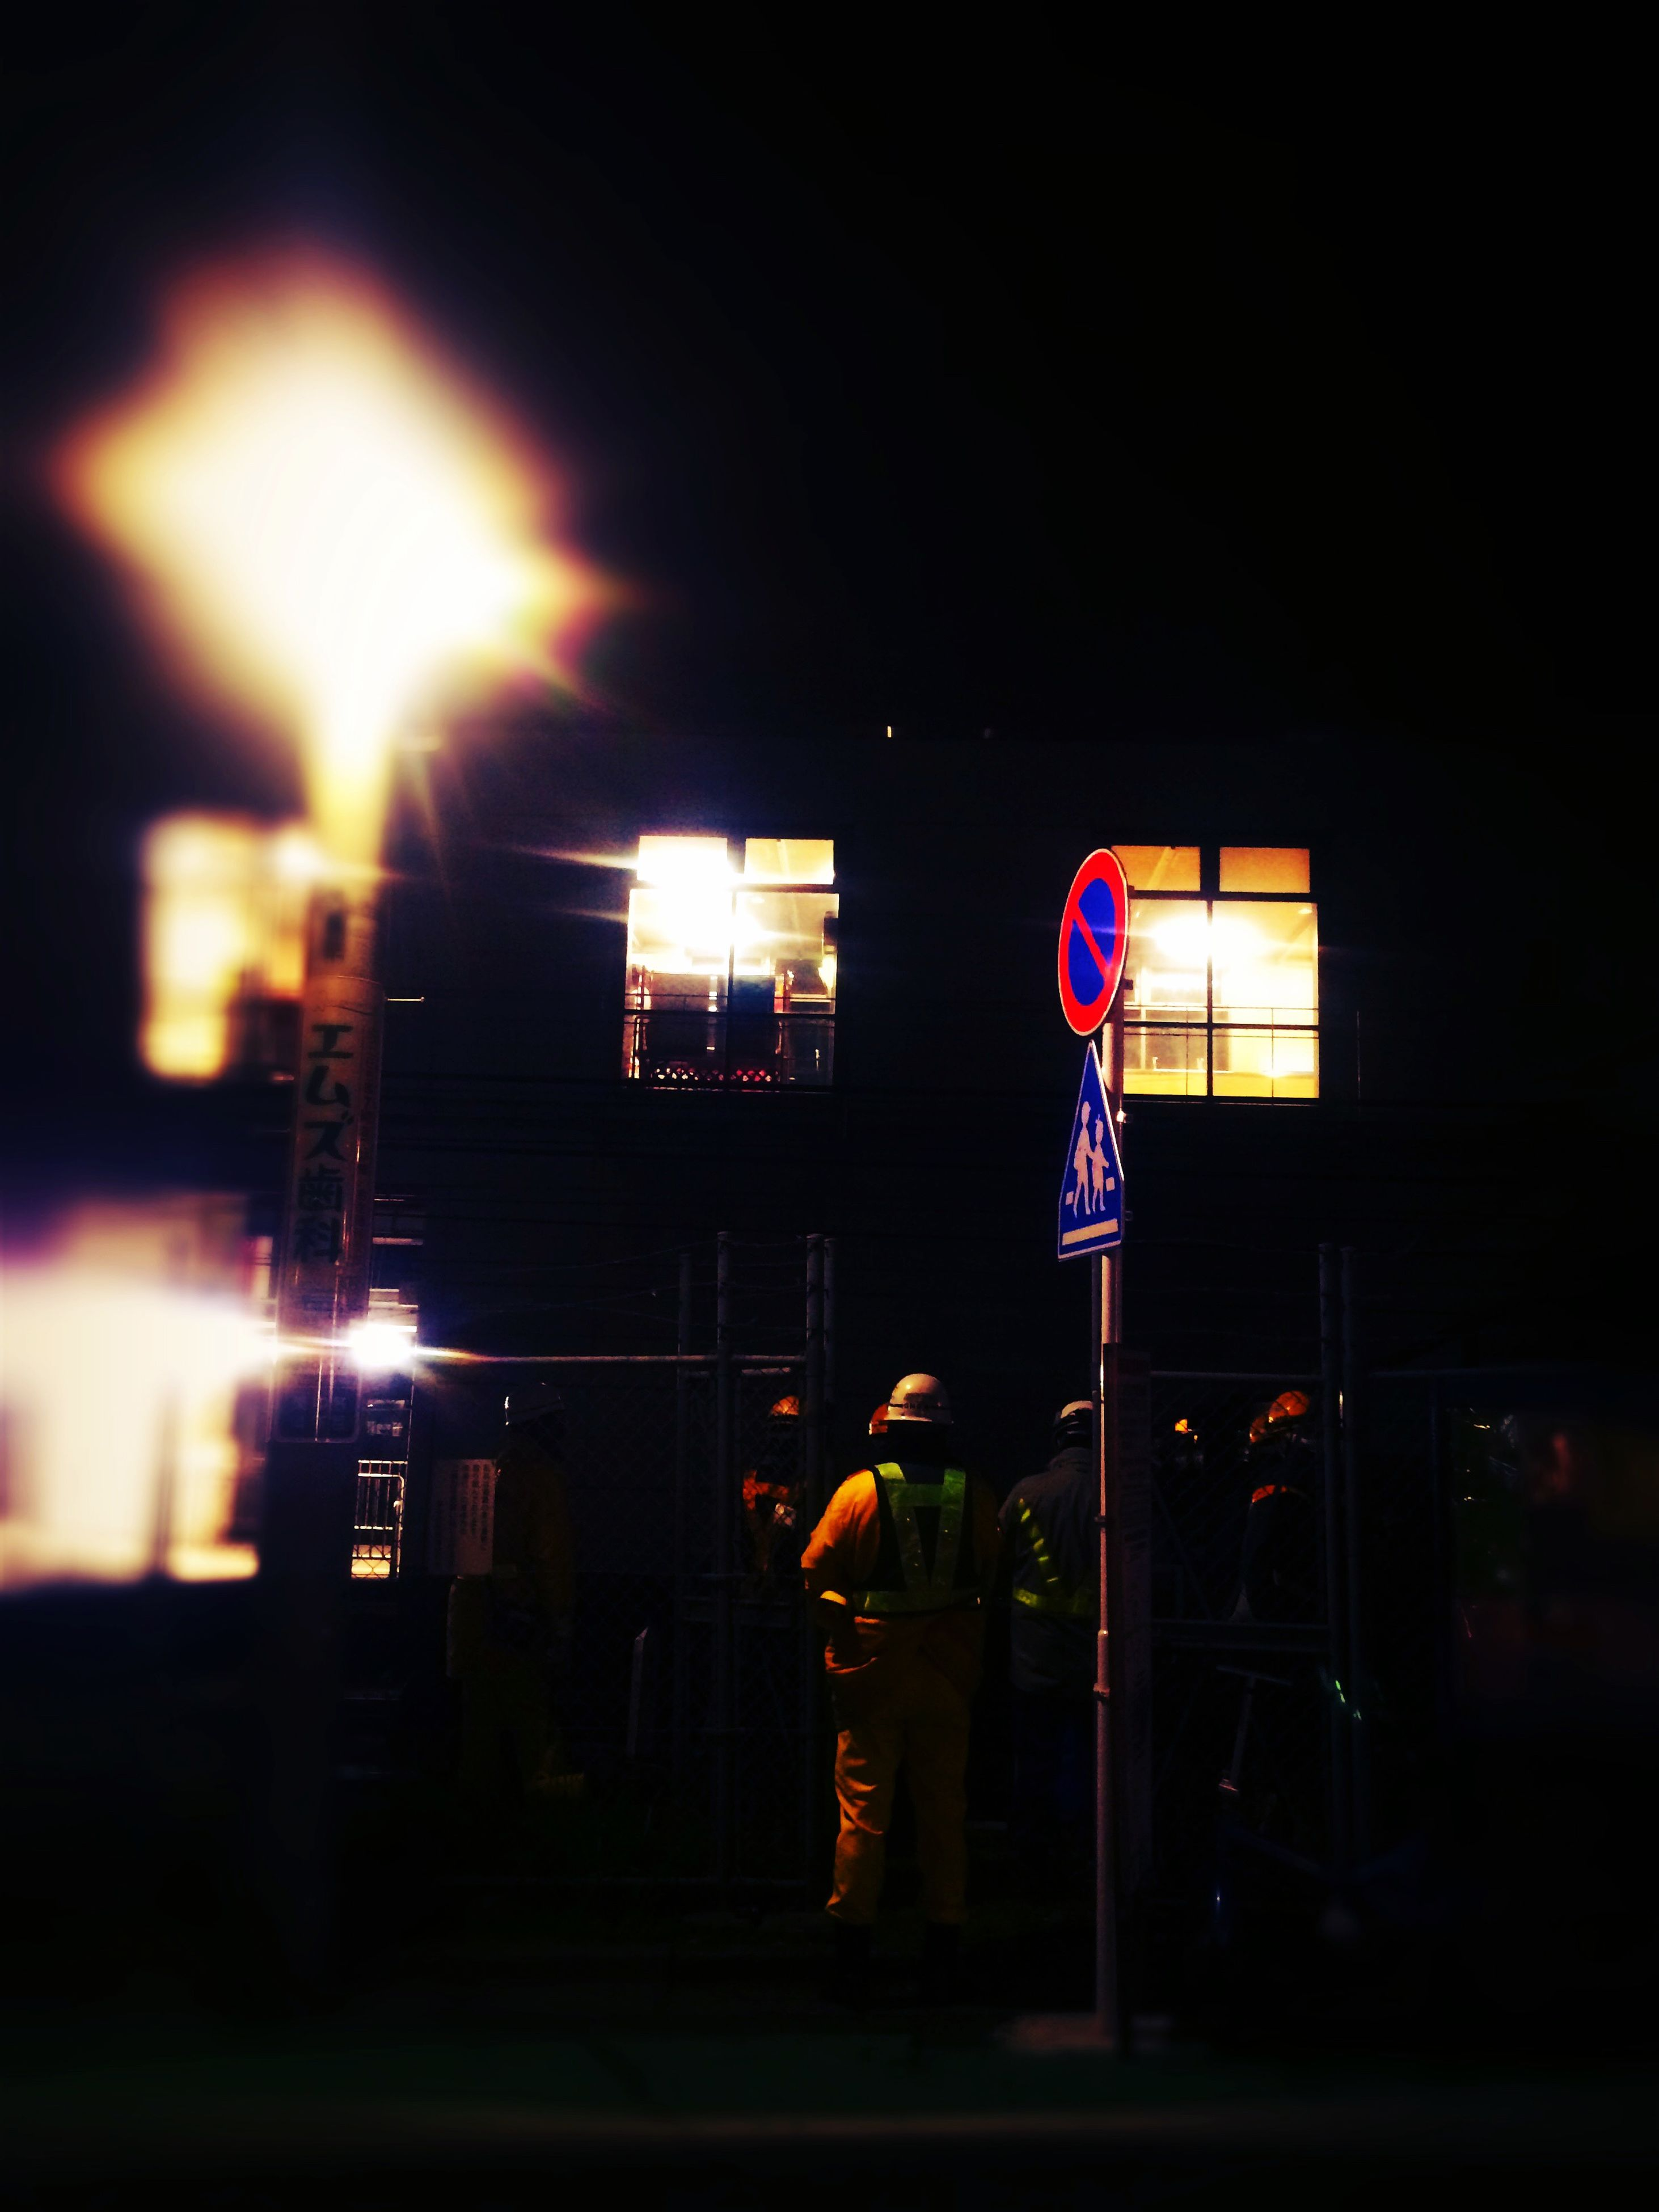 night, illuminated, building exterior, built structure, architecture, lighting equipment, city, street, outdoors, street light, red, human representation, light - natural phenomenon, men, dark, rear view, lantern